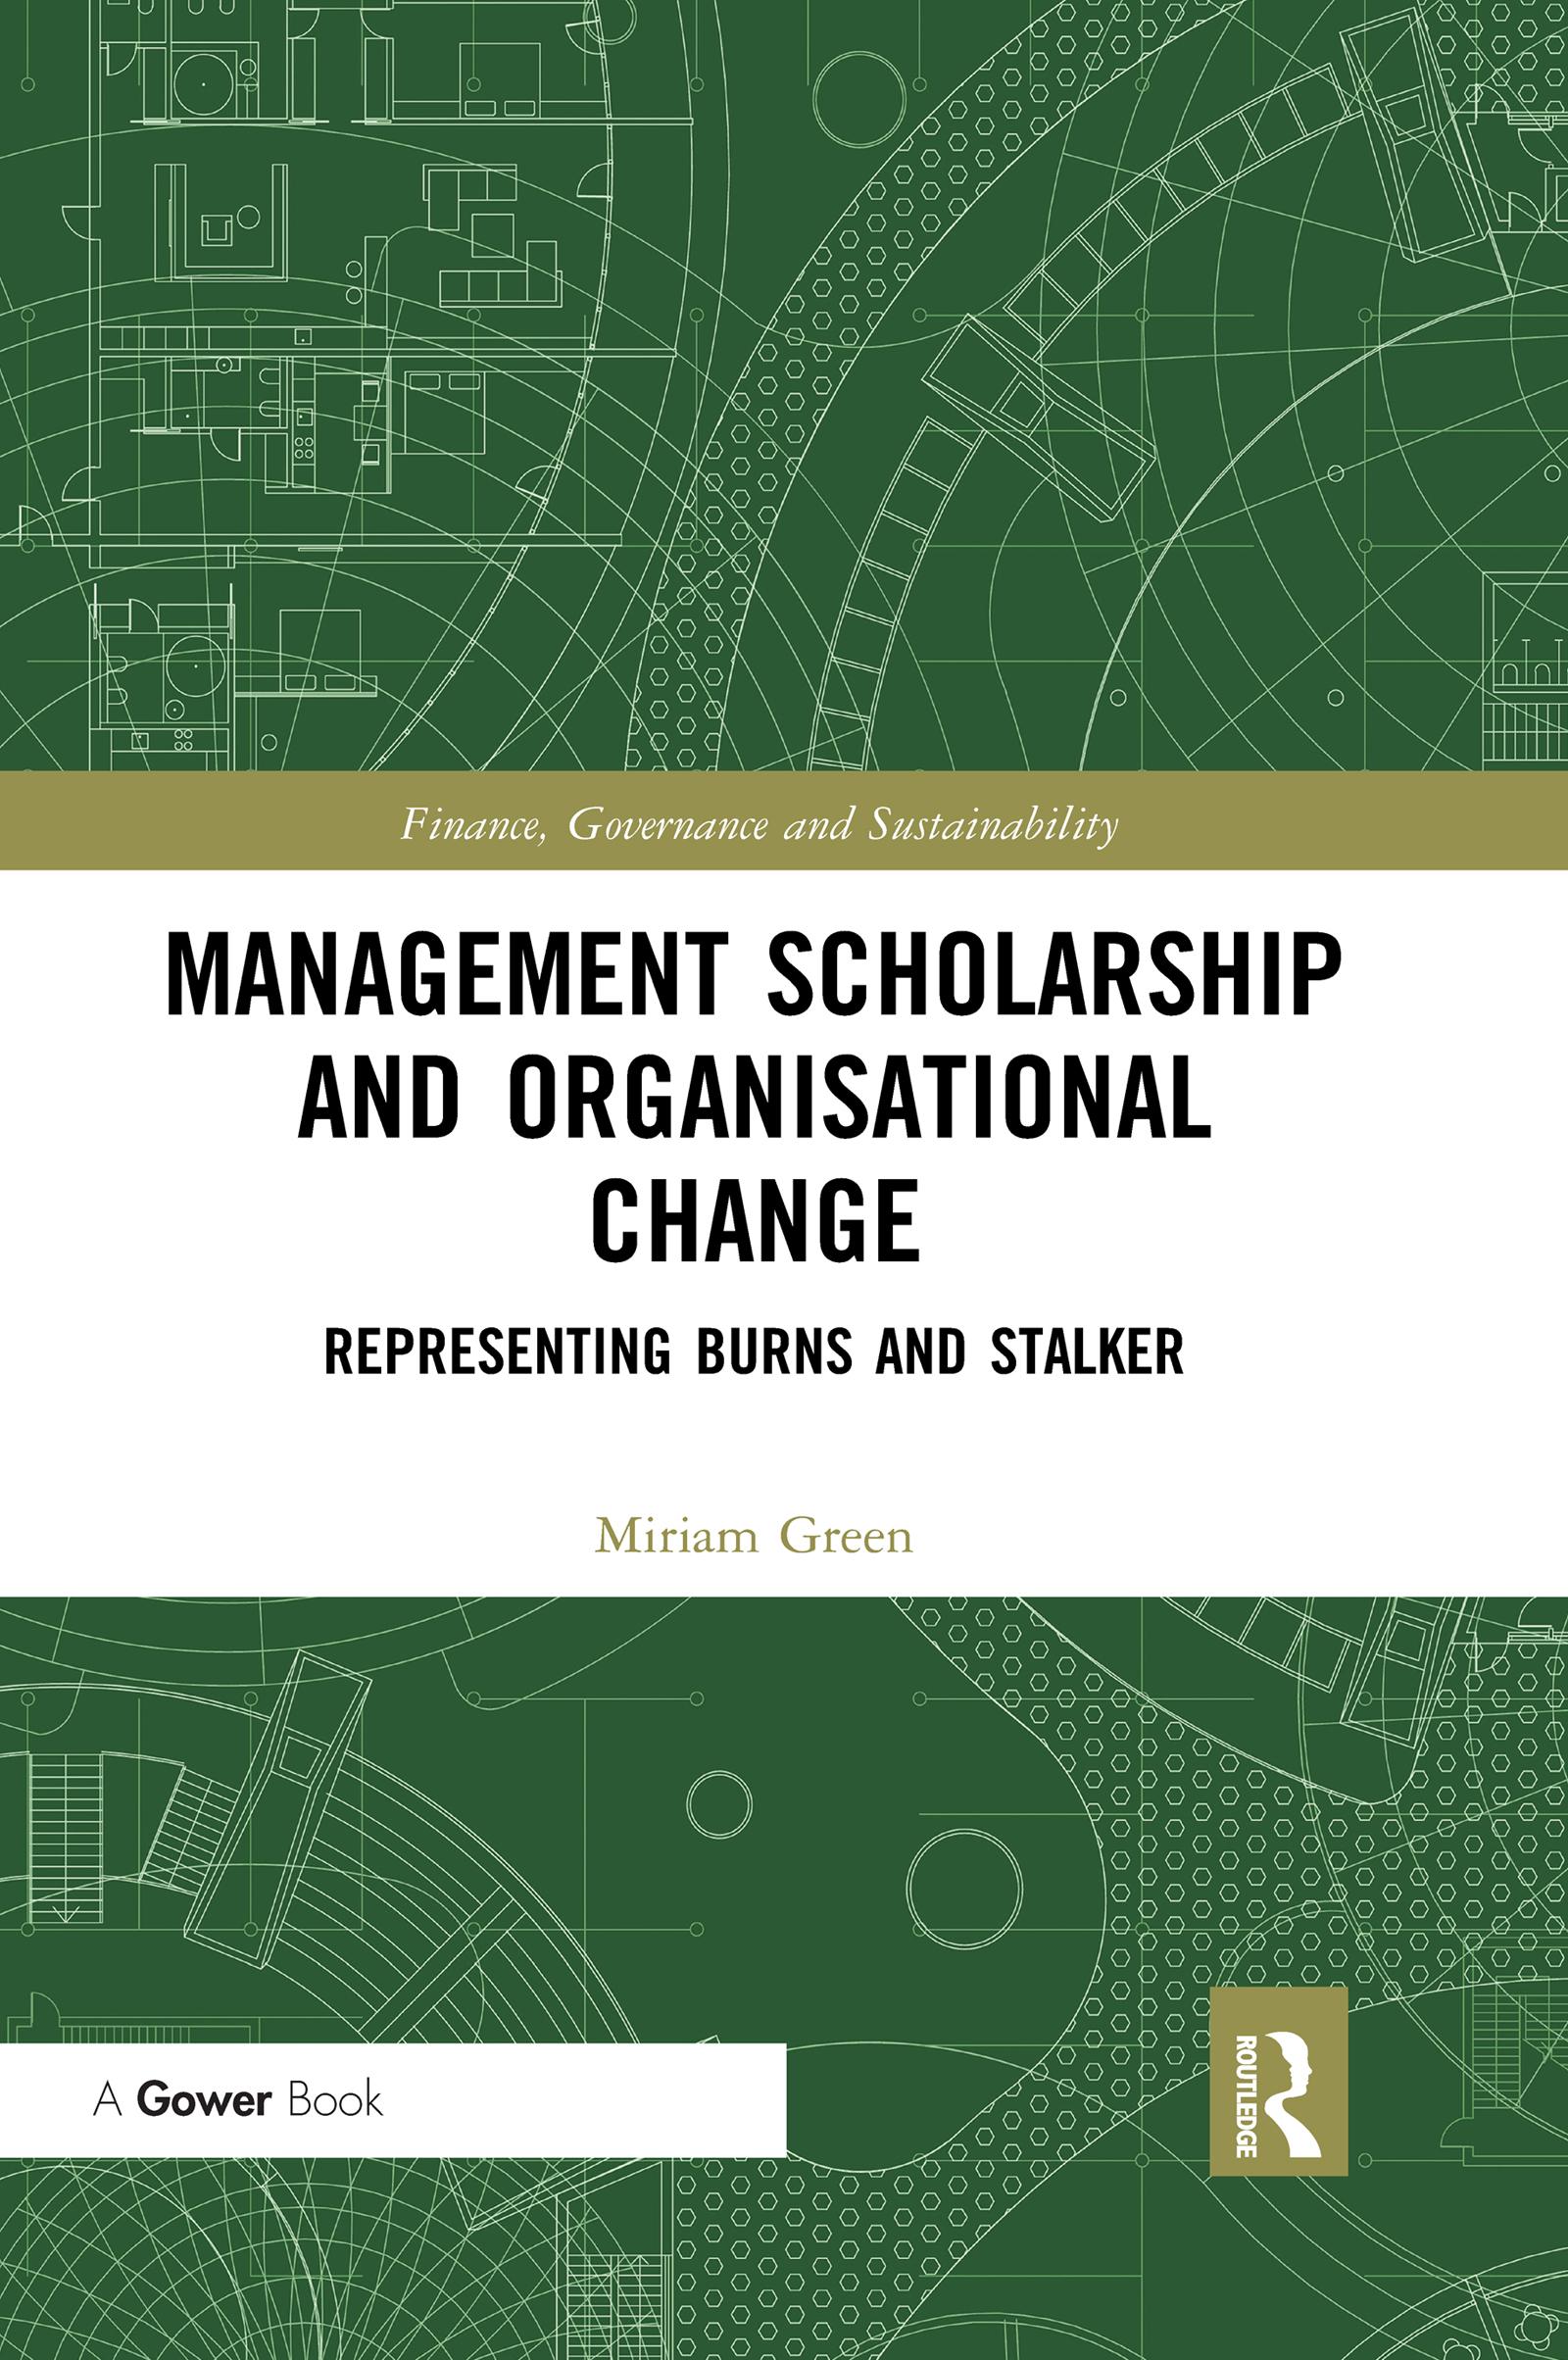 Management Scholarship and Organisational Change